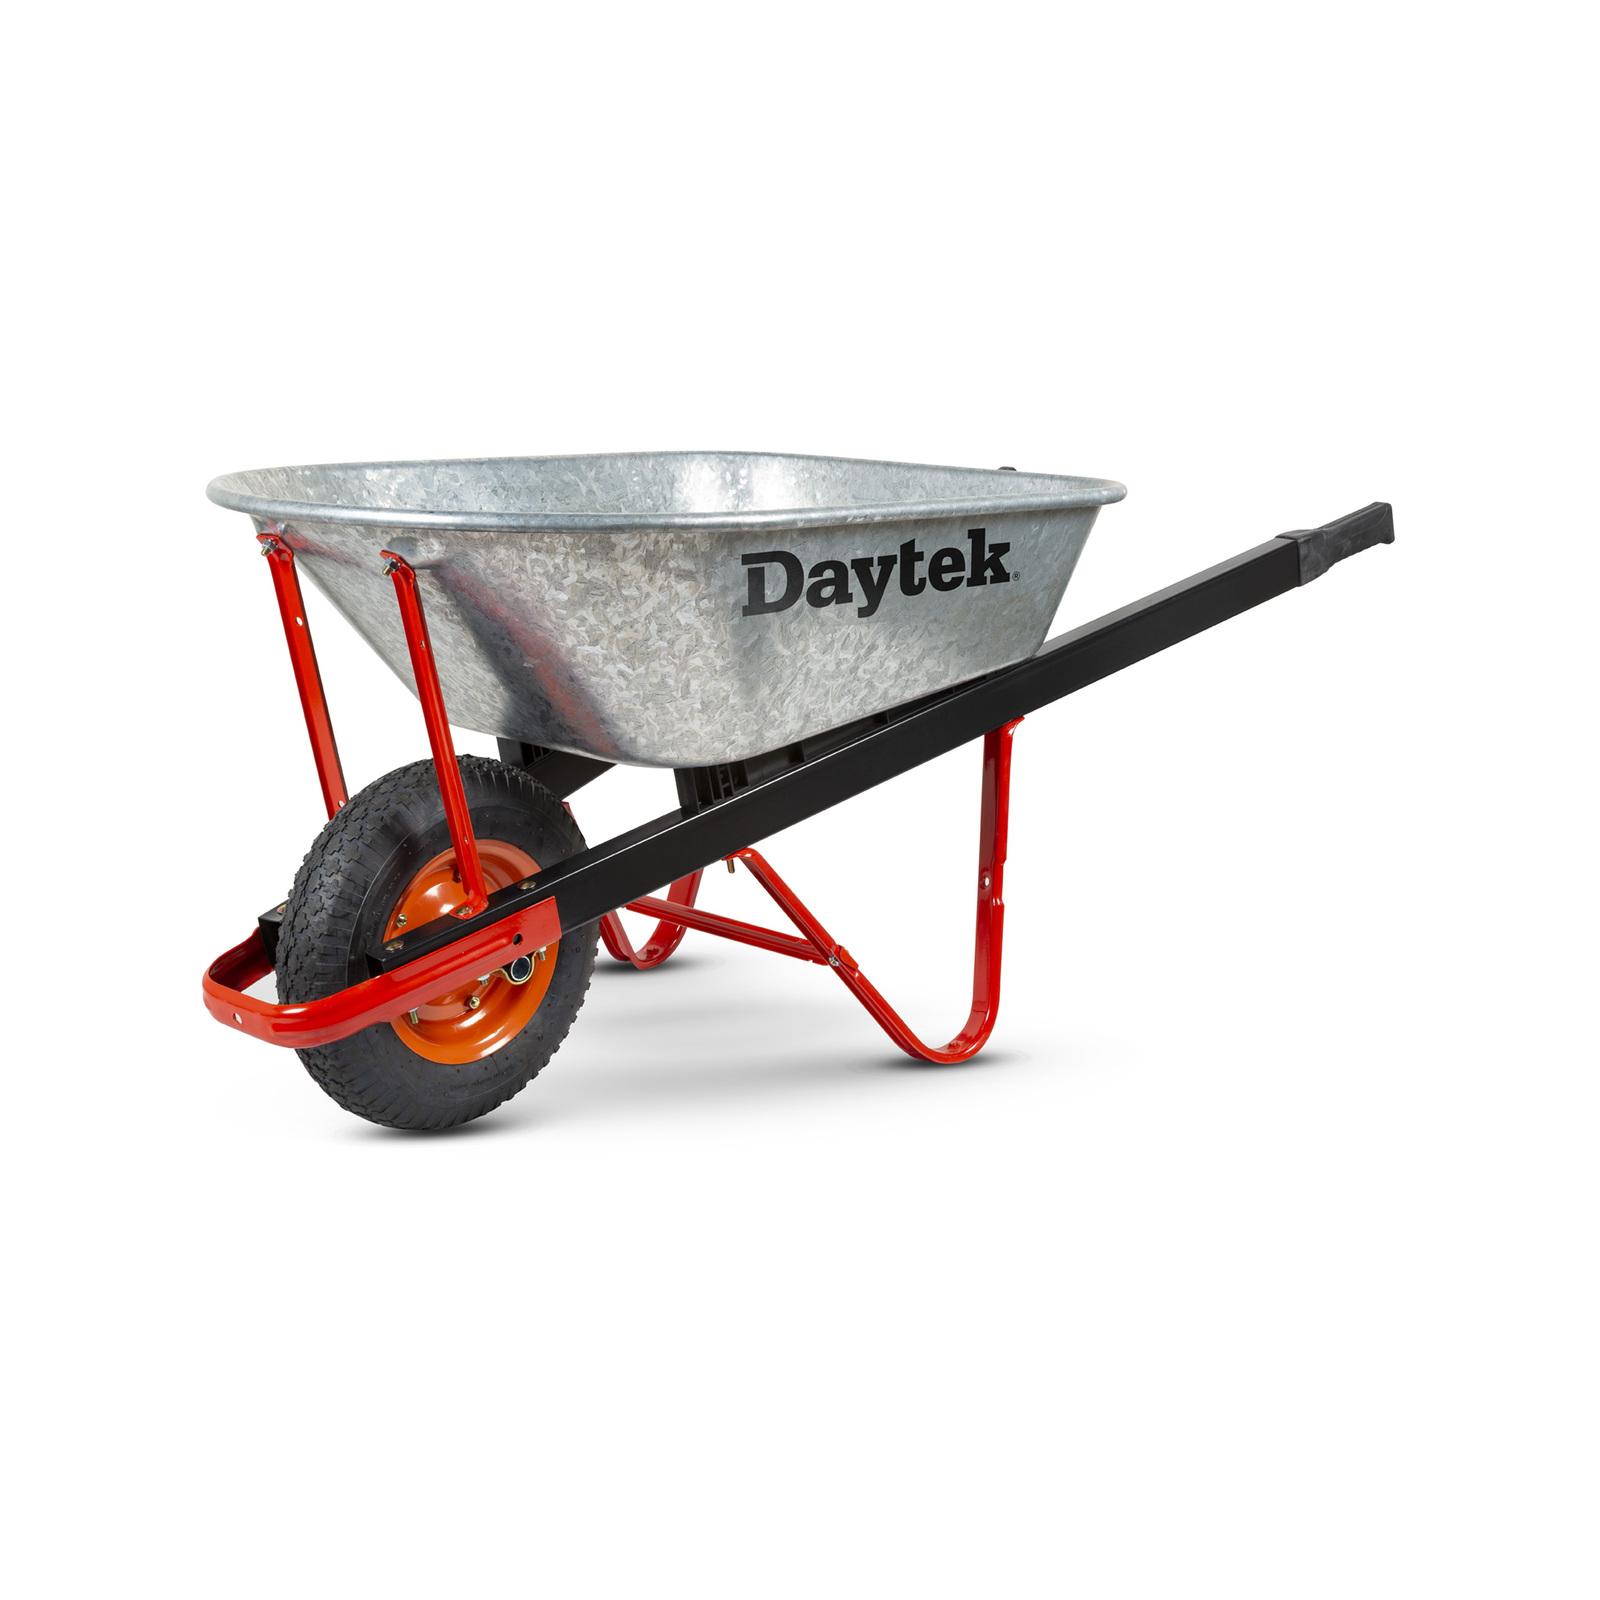 Daytek 100L Galvanised Tradesman Wheelbarrow